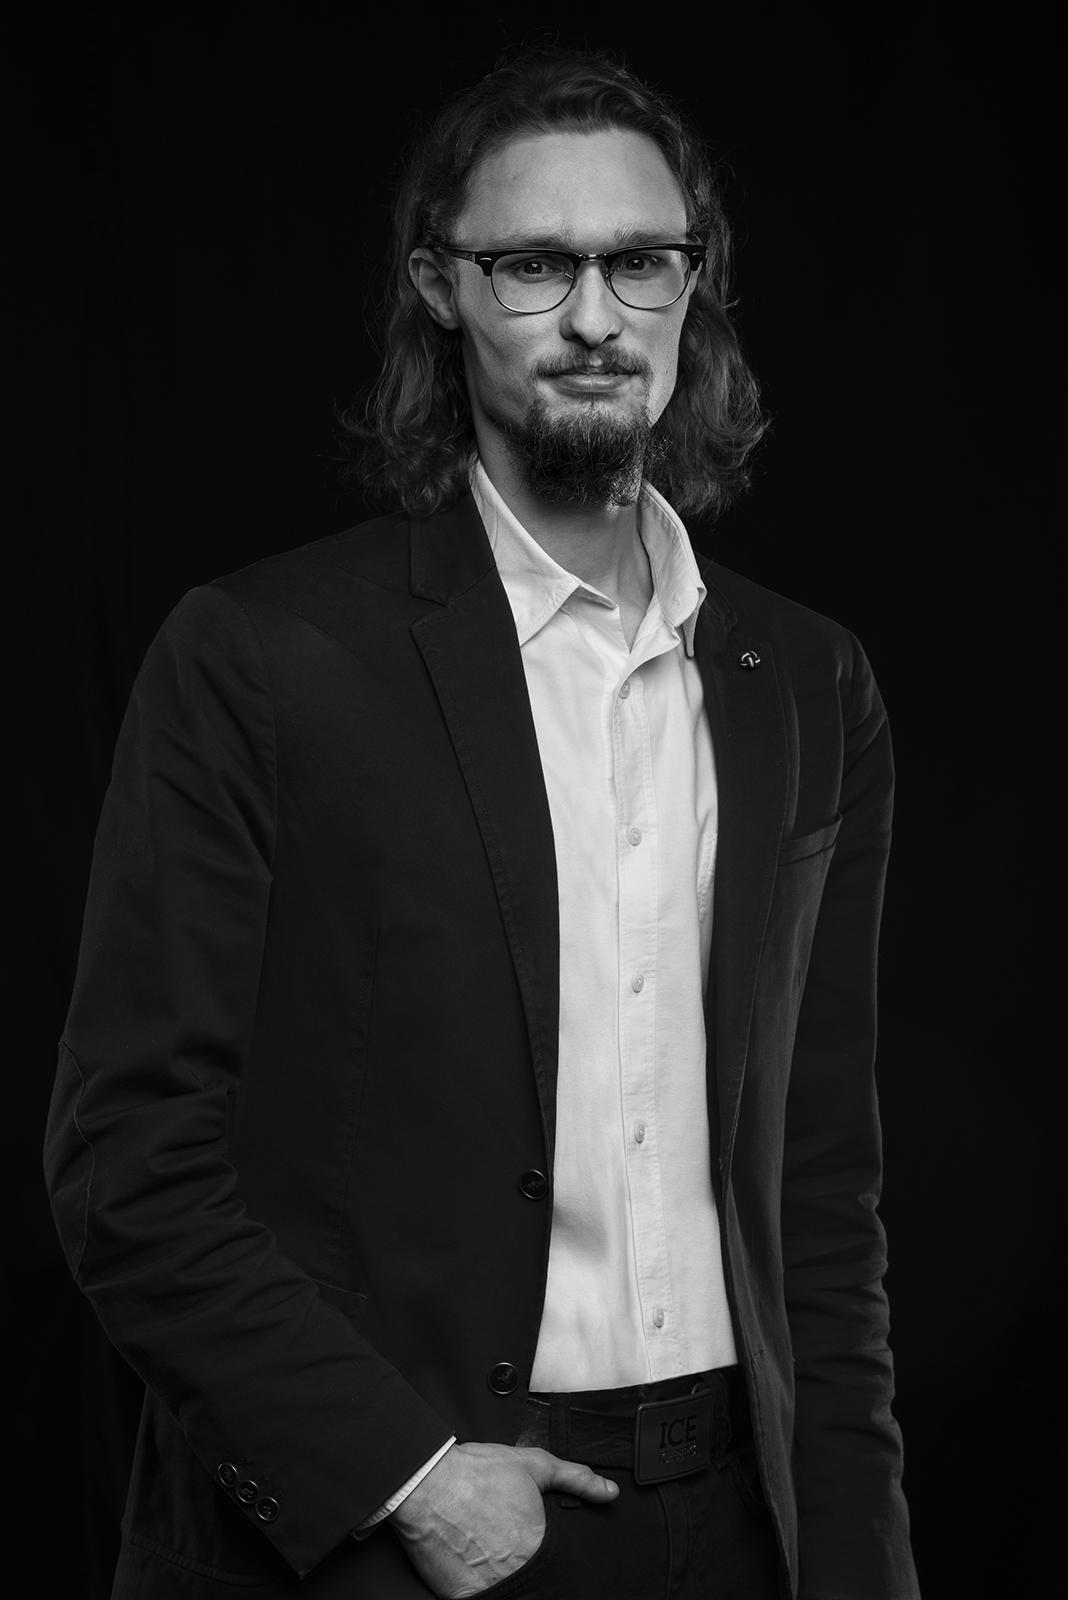 Ignacy Stefaniuk